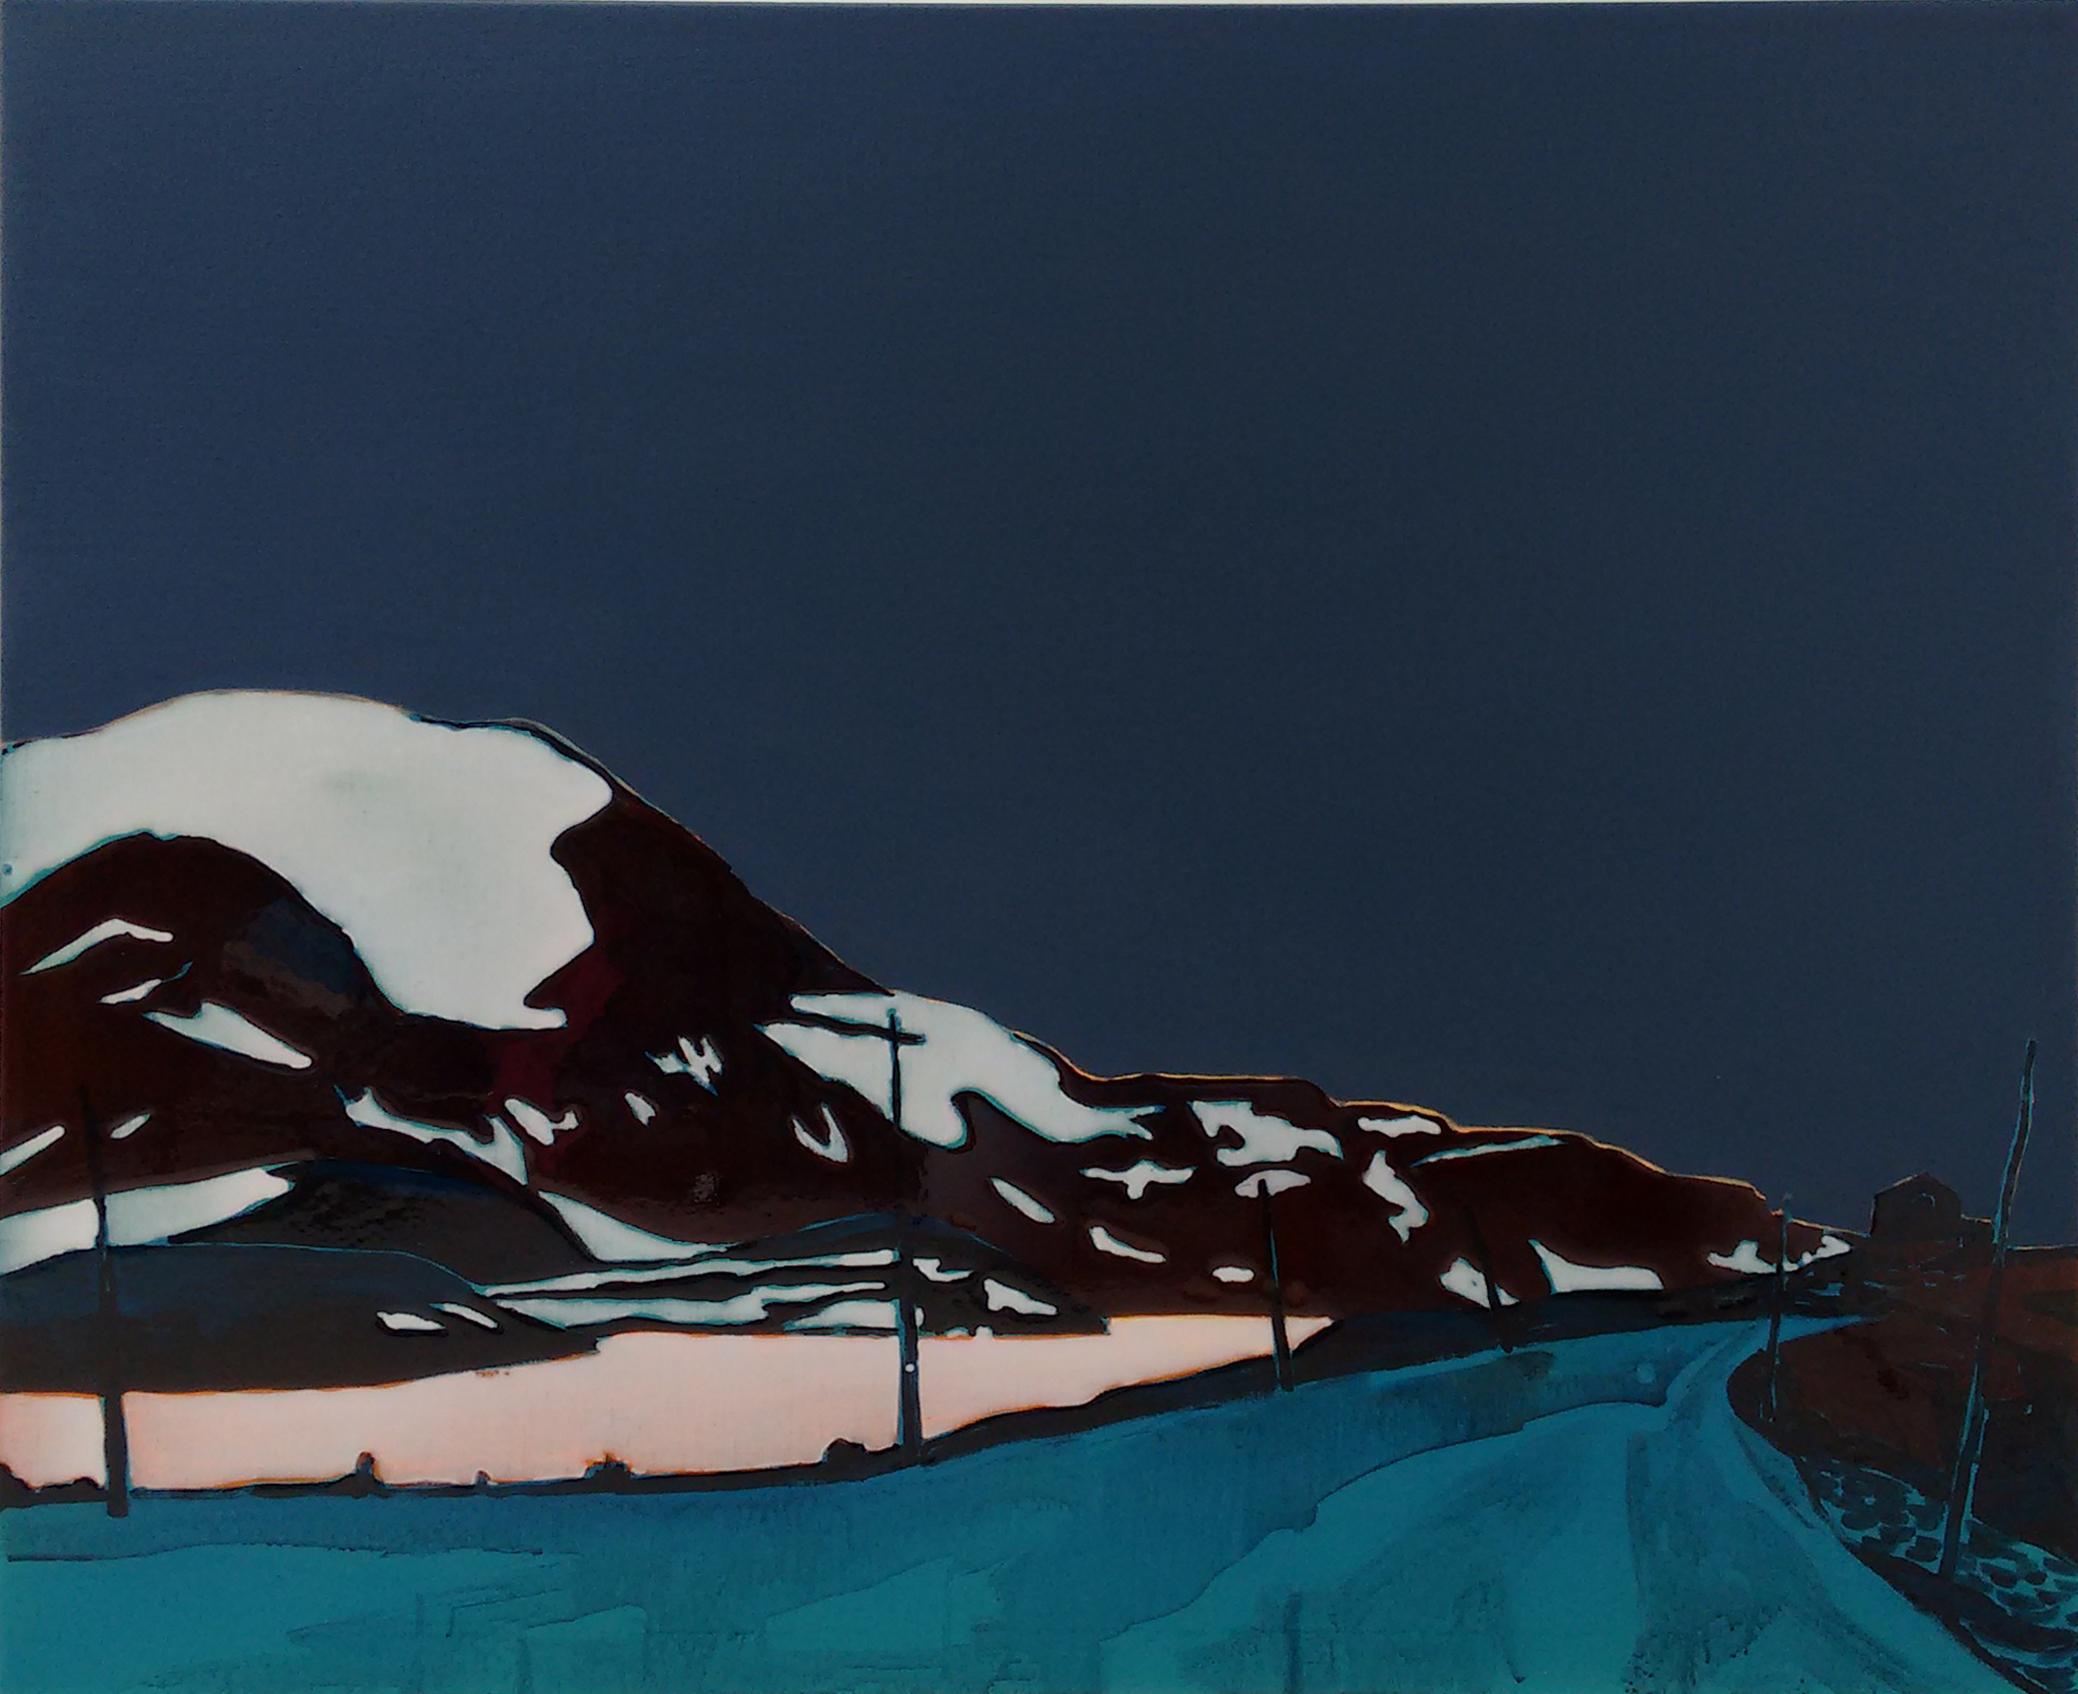 SOGNEFJELLSVEGEN 1  120x100 cm acrylic and epoxy on canvas  Sold